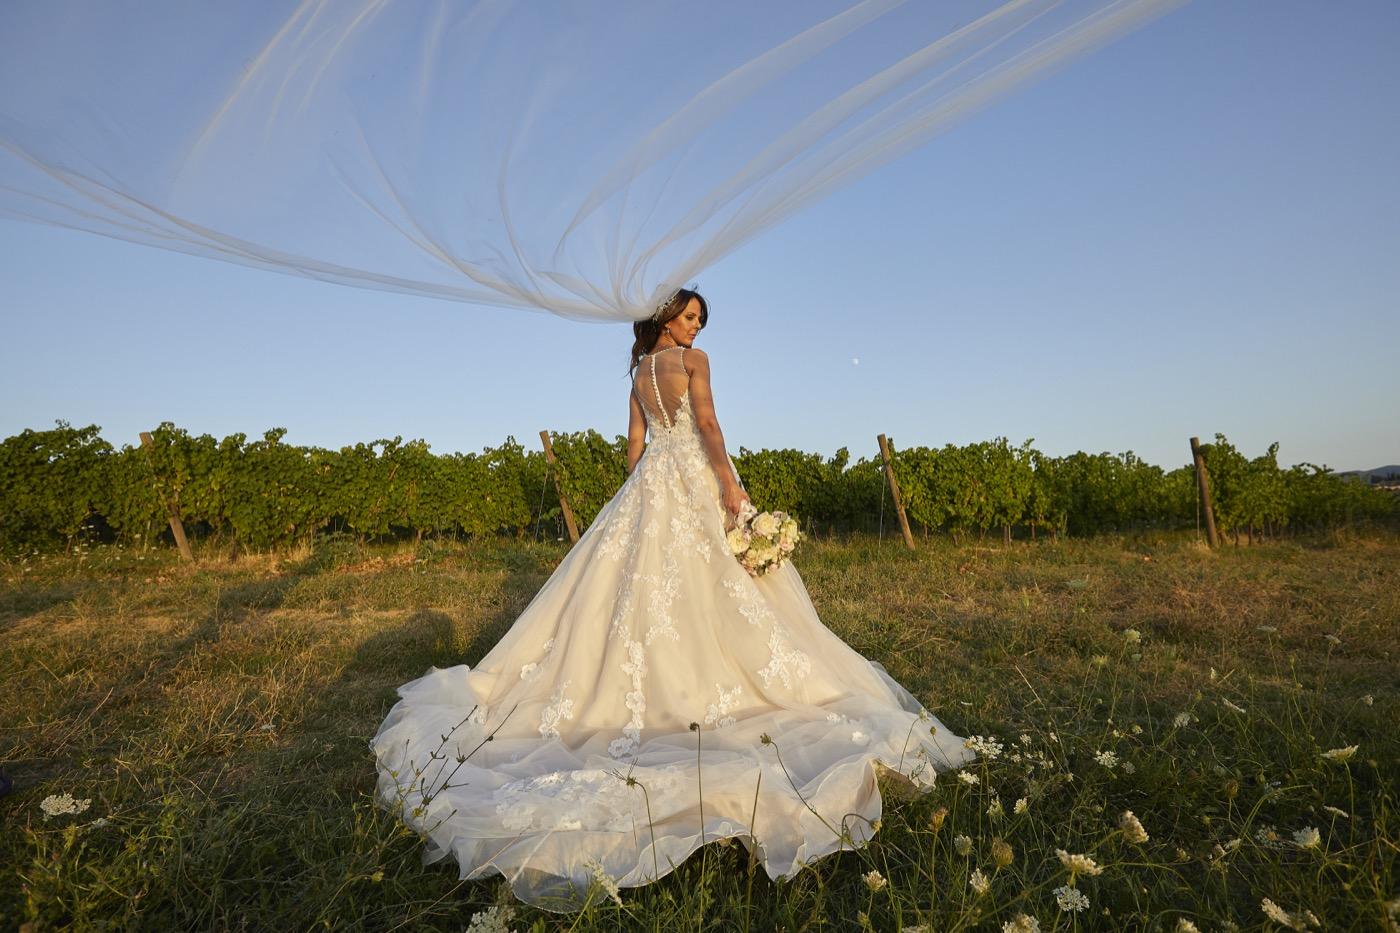 Claudio-Coppola-wedding-photographer-la-scuderia-eventi-preparativi-la-rosetta-perugia-74